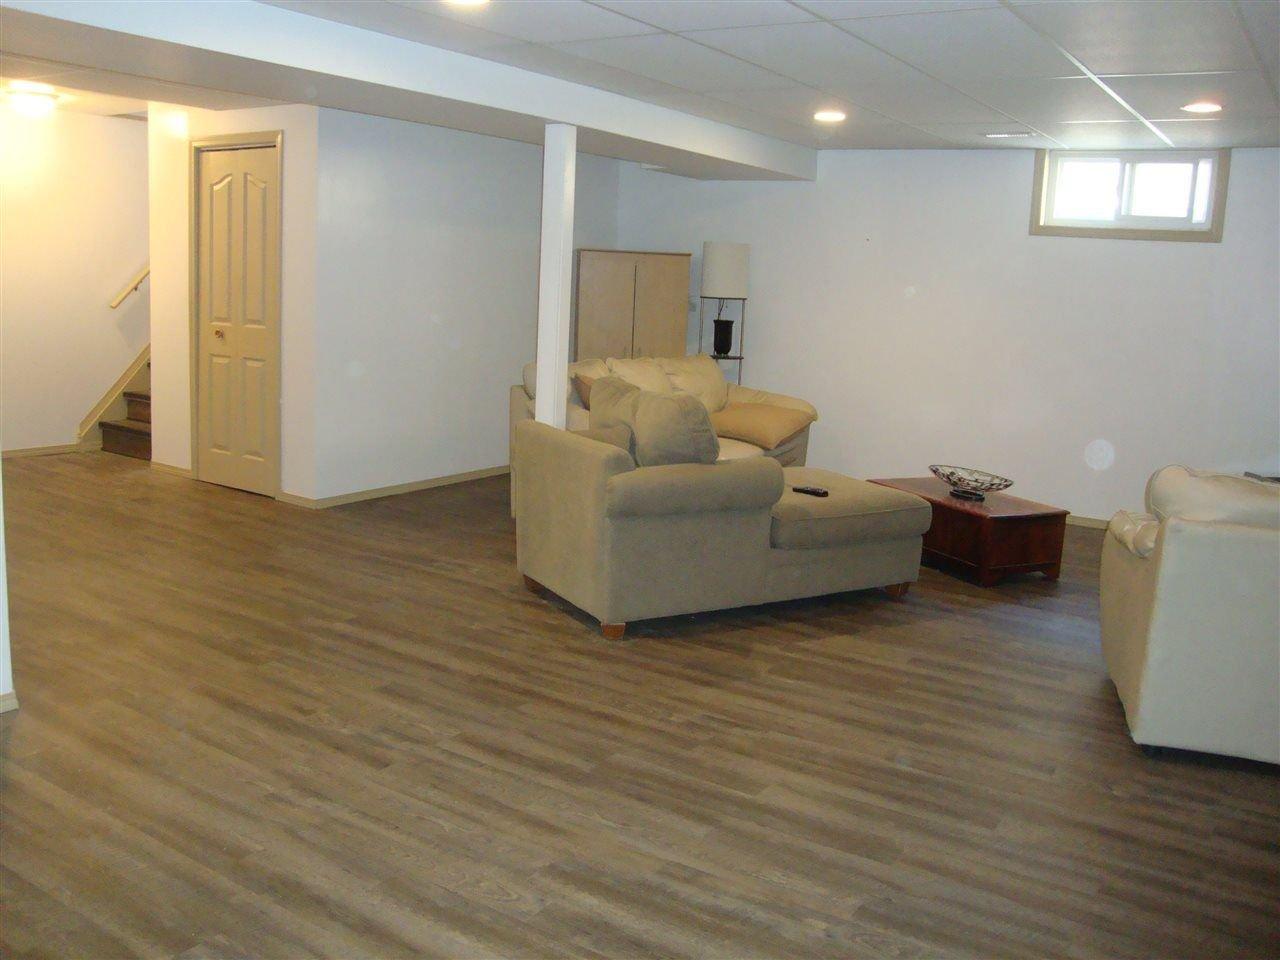 Photo 22: Photos: 4711 51A Avenue: Bon Accord House for sale : MLS®# E4149195